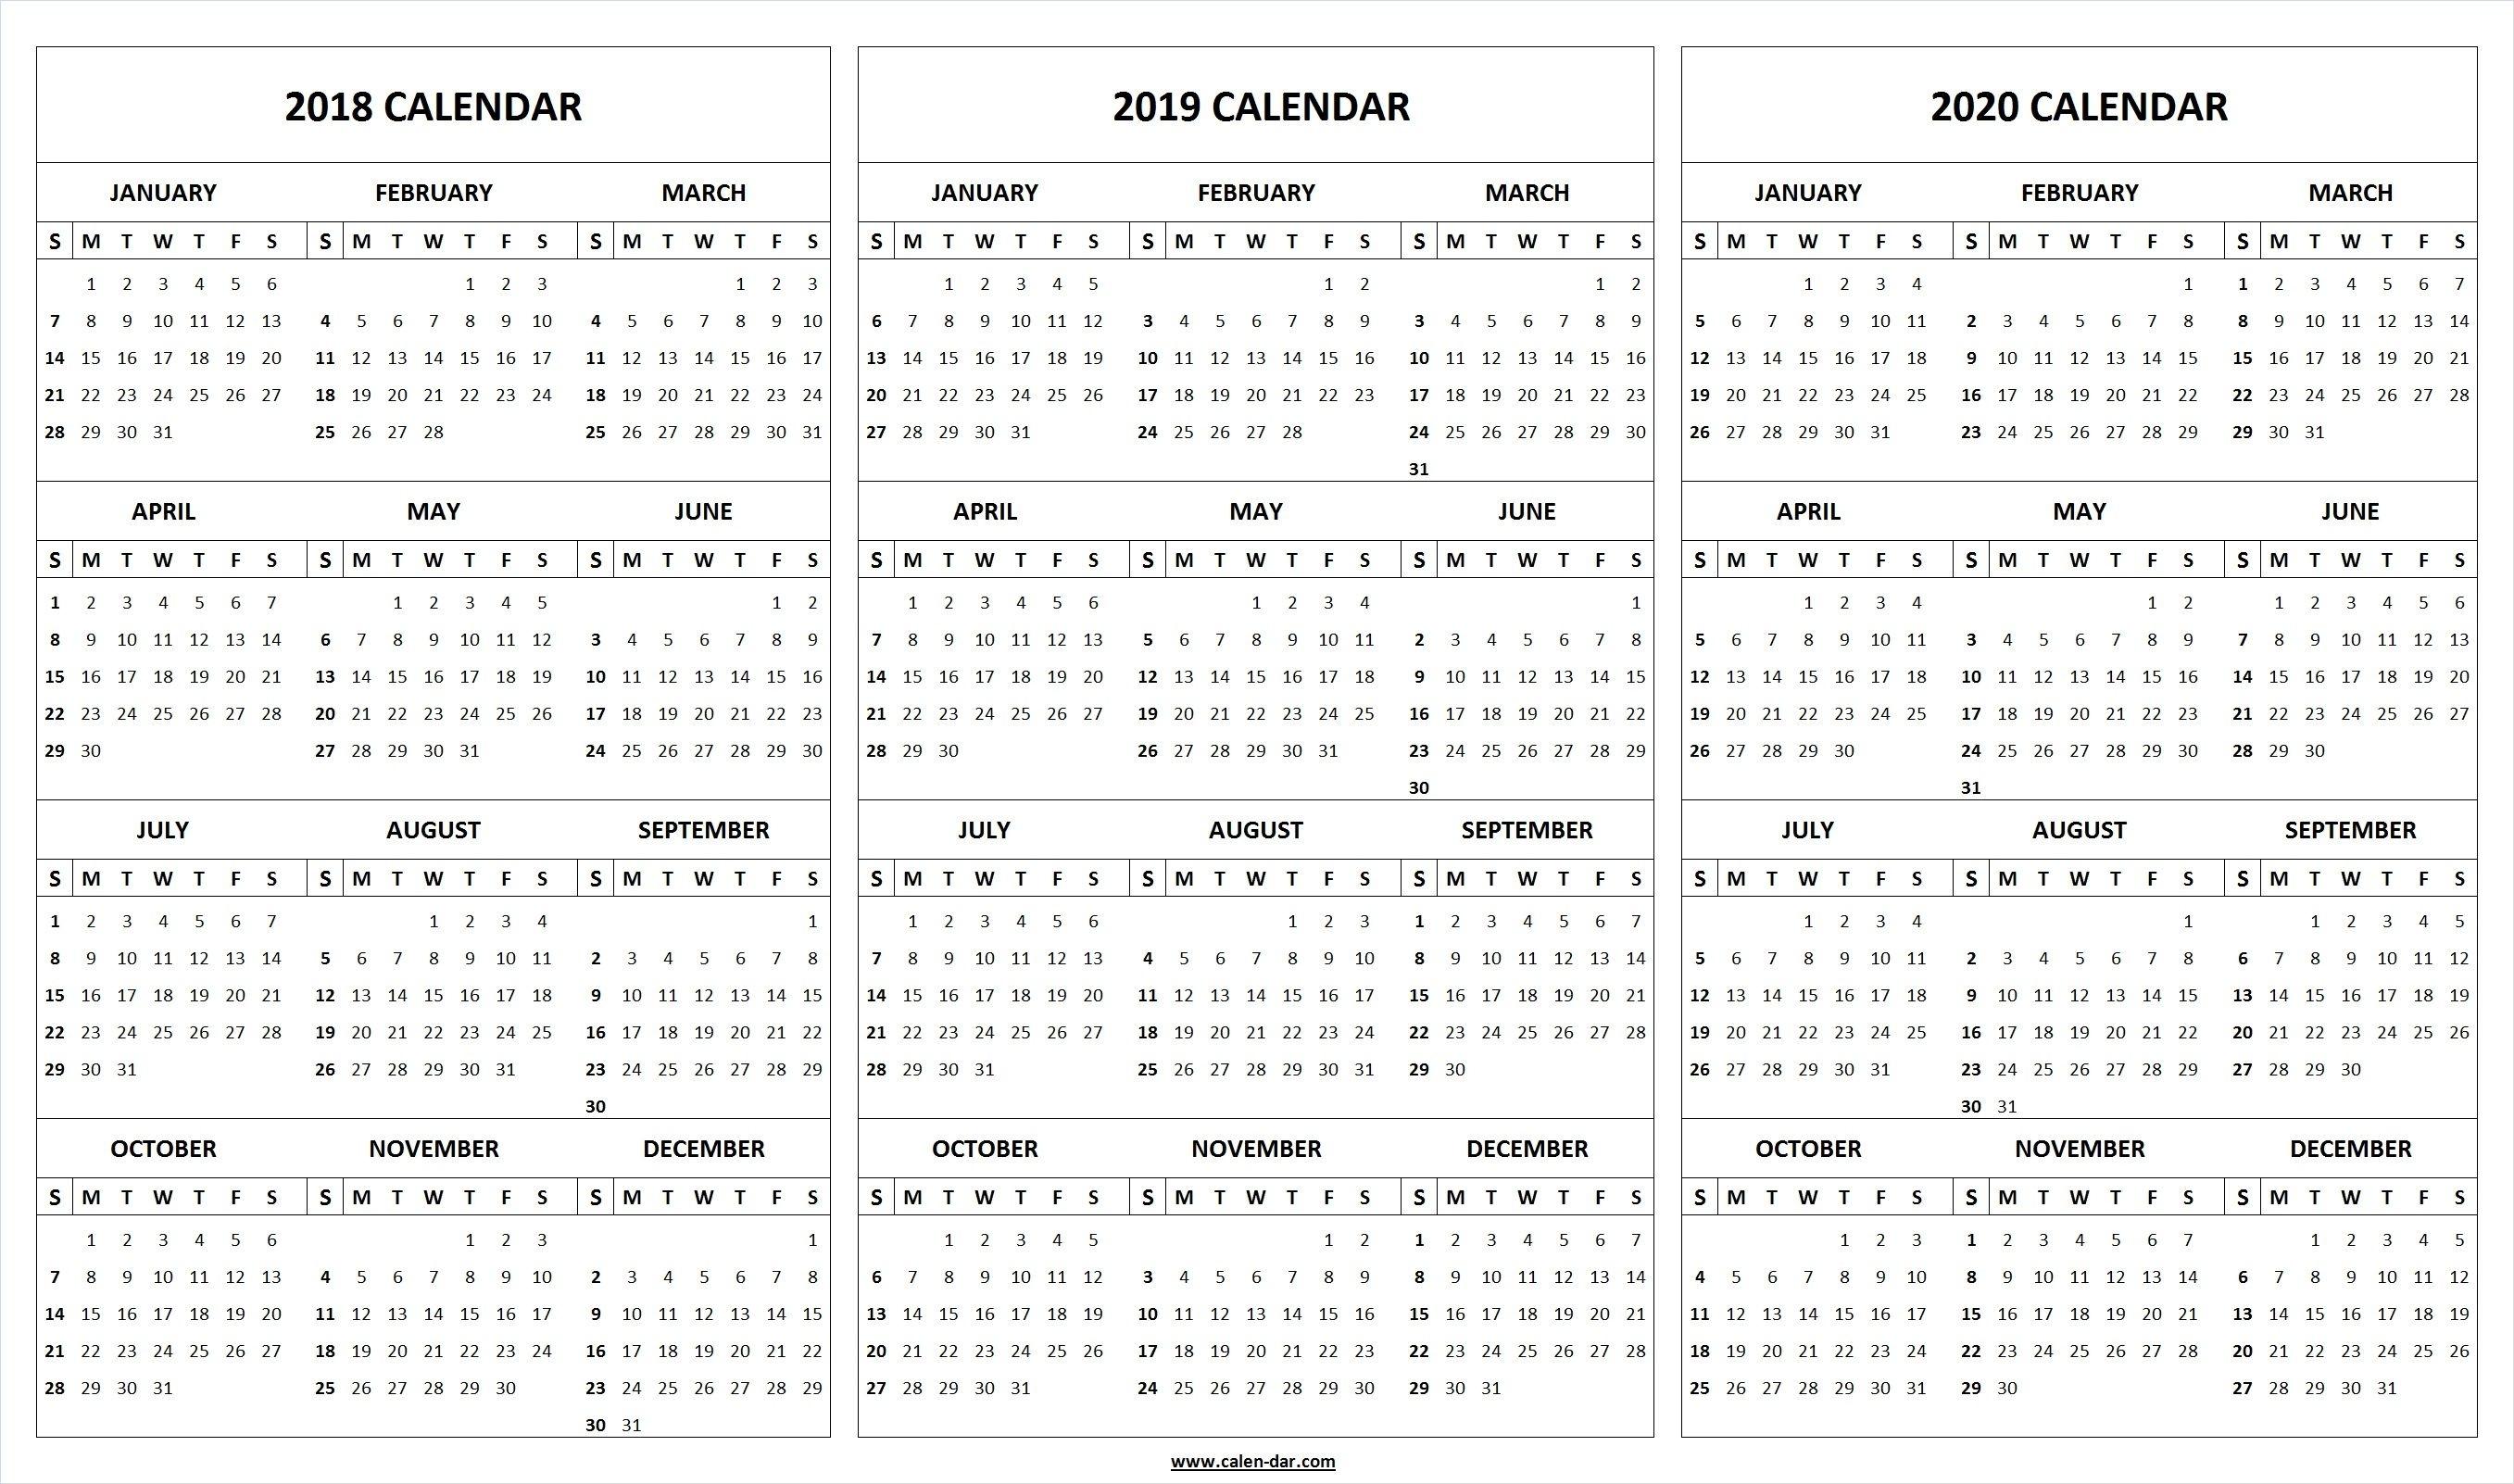 Print Blank 2018 2019 2020 Calendar Template | Organize! | 2021 with School Calendar Template Monday Thursday